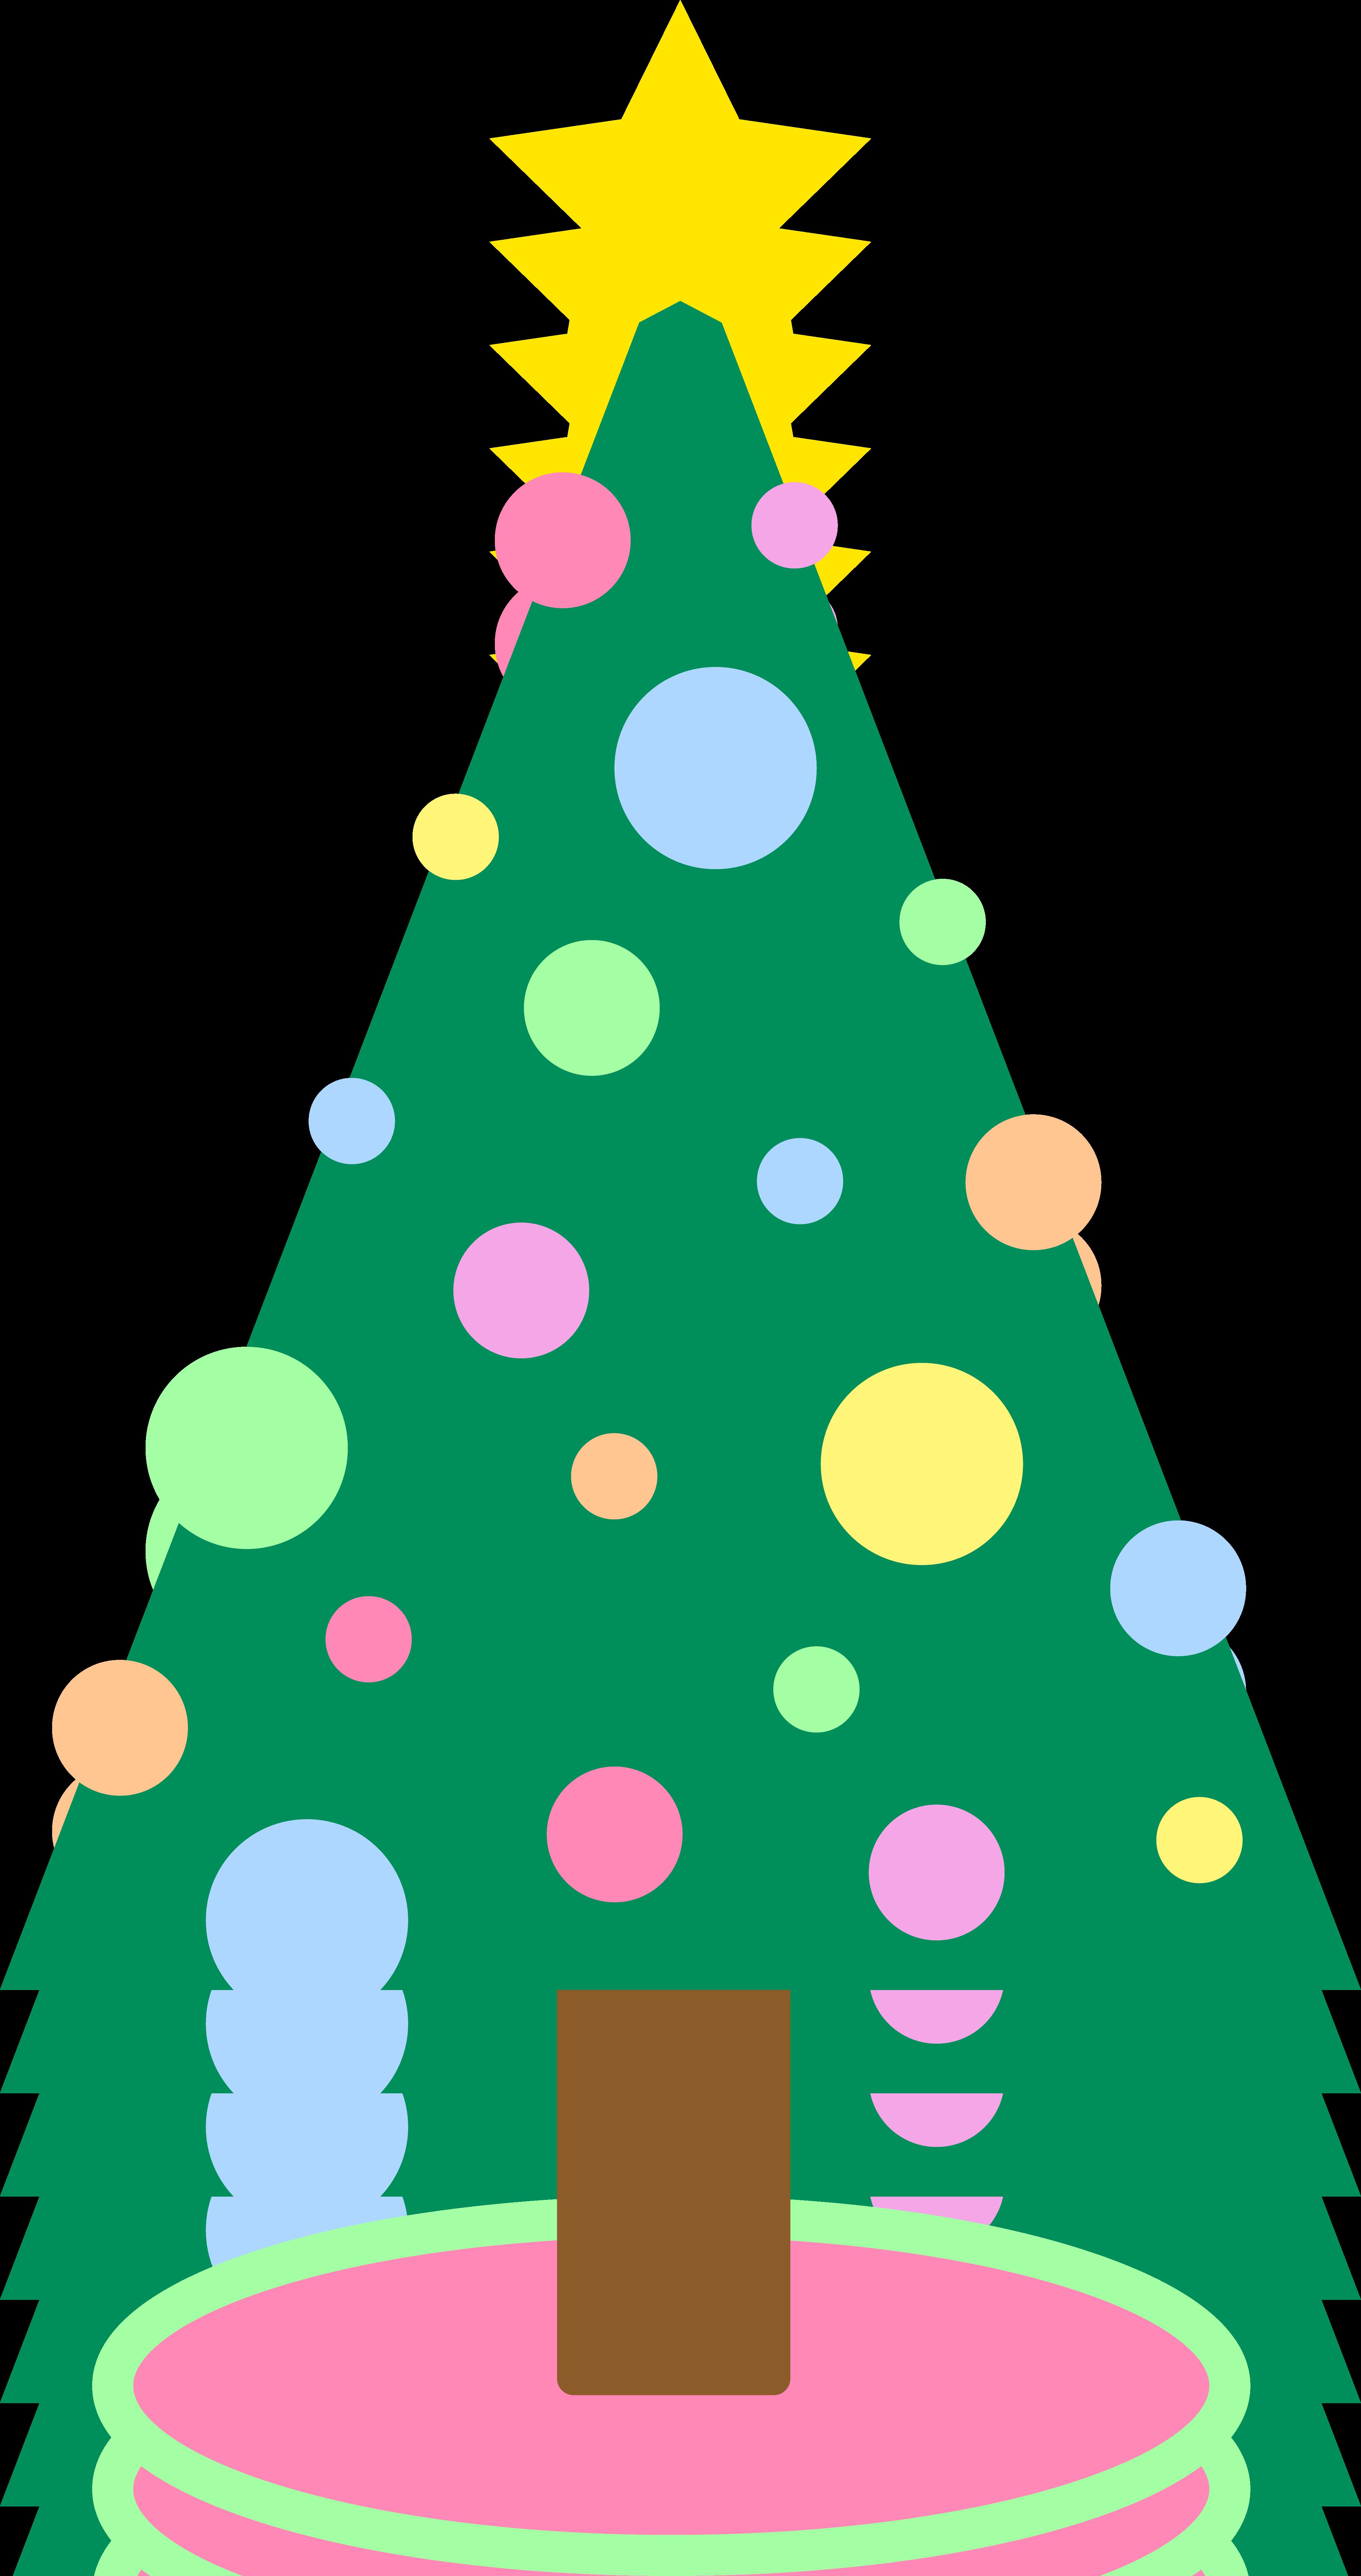 4150x7856 Cute Simple Pastellored Christmas Tree Free Clip Art